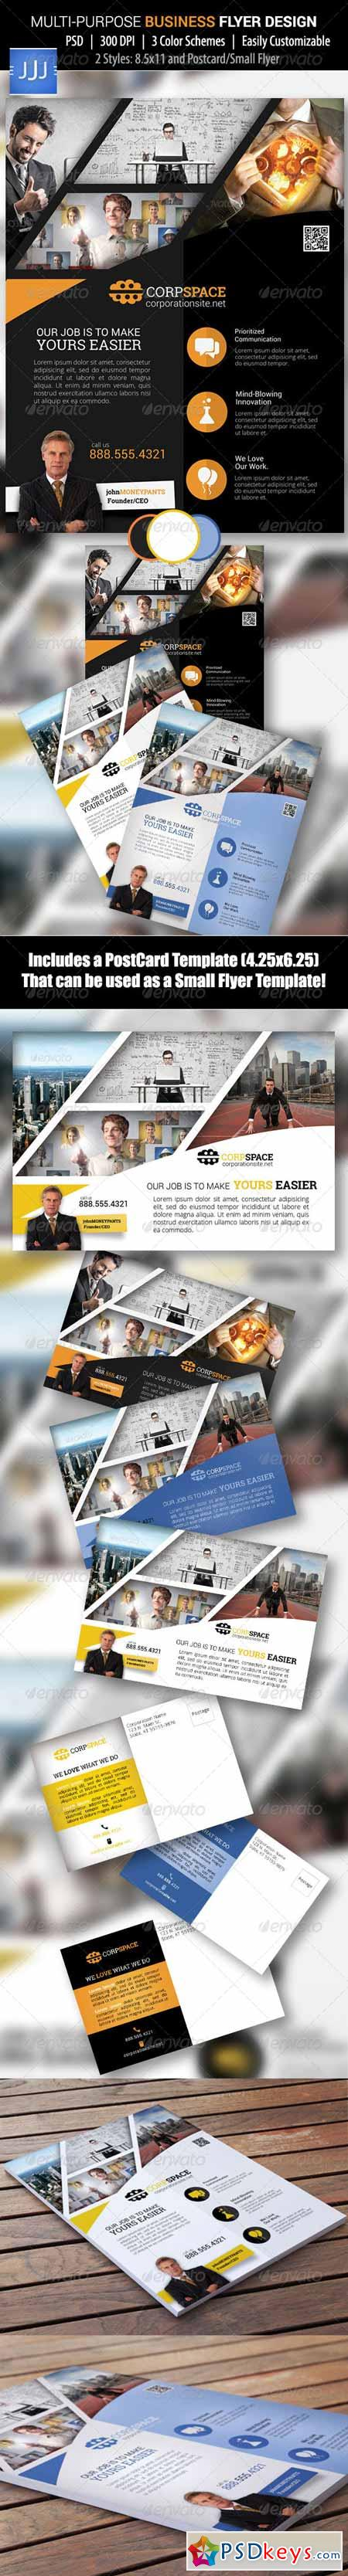 business flyer 38 postcard 8296191 photoshop business flyer 38 postcard 8296191